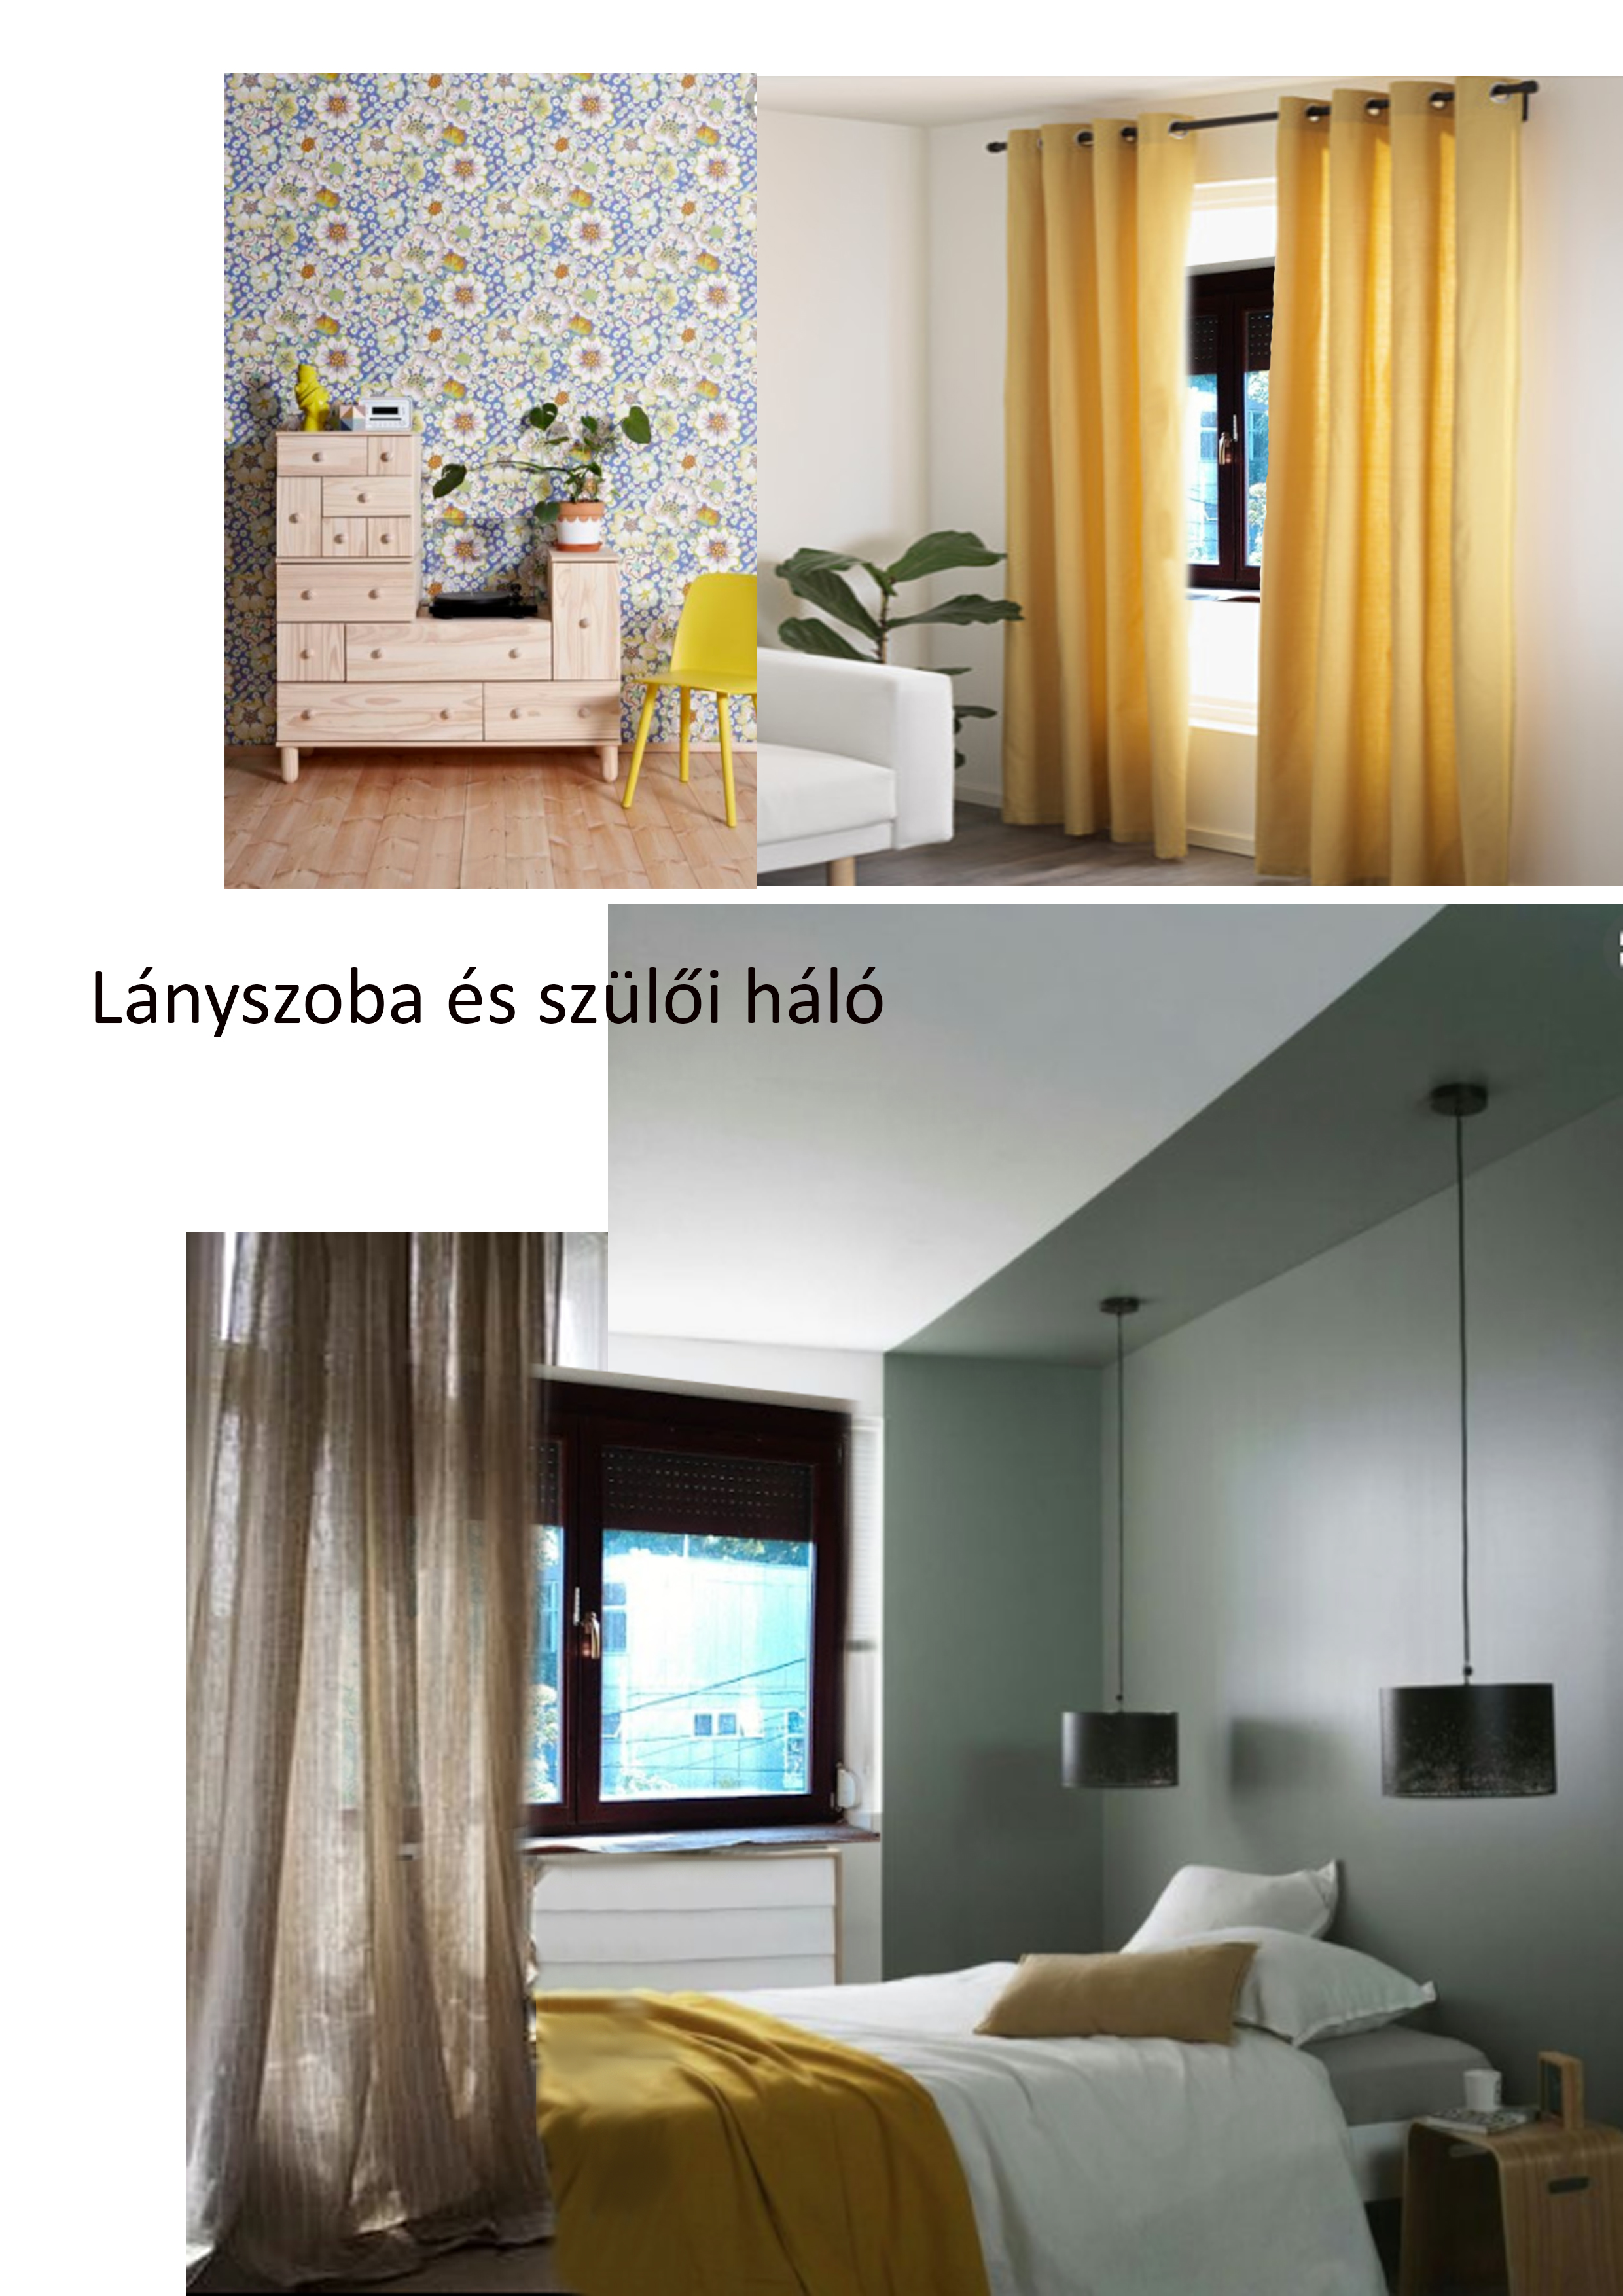 lanyszoba_szuloi_halo.jpg